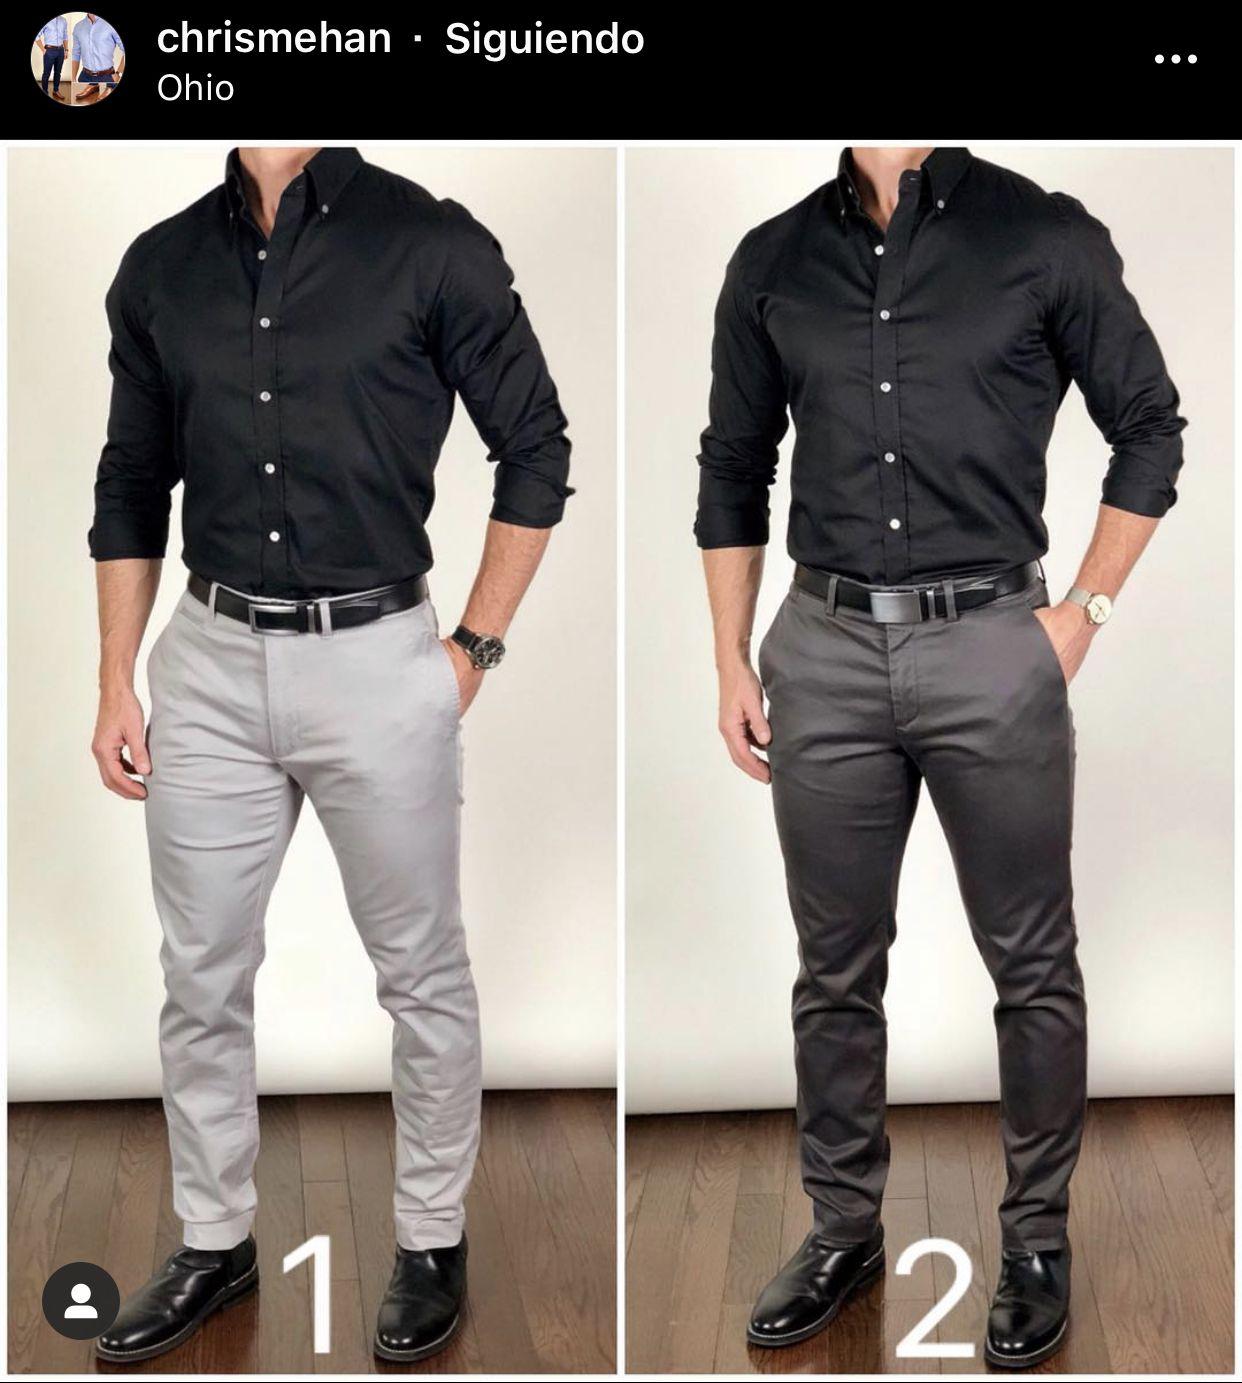 Pin By Hansen Bun On Great Outfit Black Shirt Outfit Men Shirt Outfit Men Pants Outfit Men [ 1383 x 1242 Pixel ]